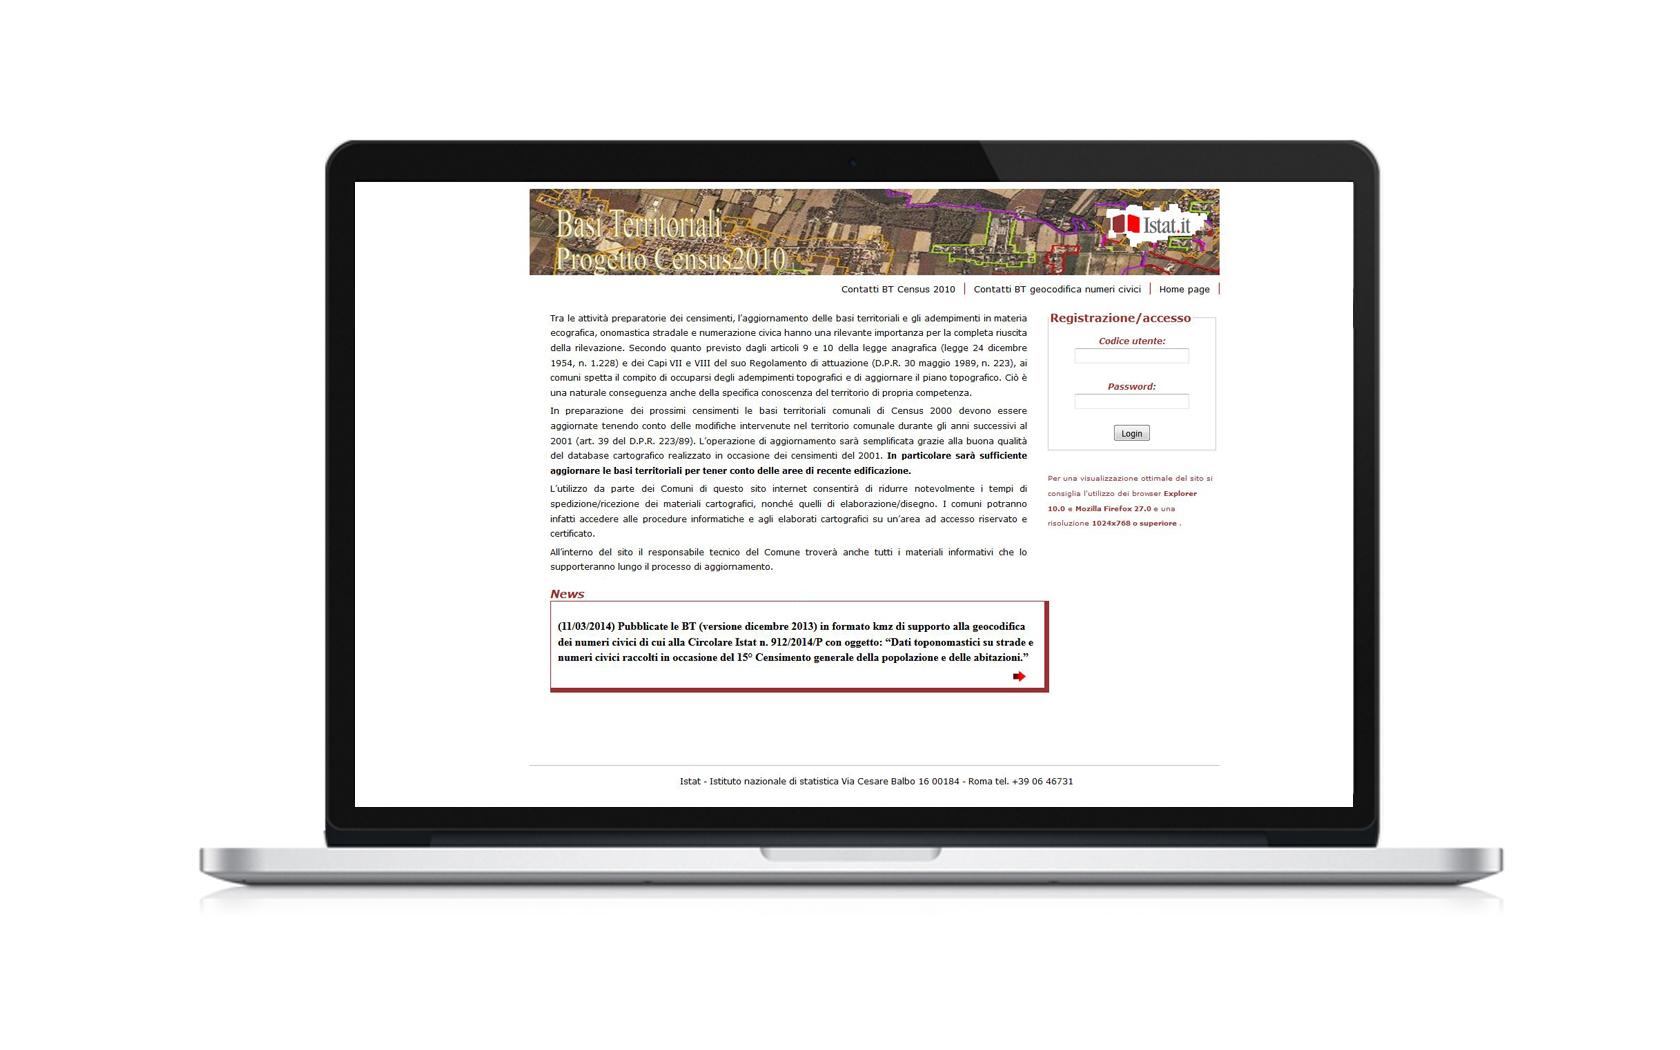 Basi territoriali homepage